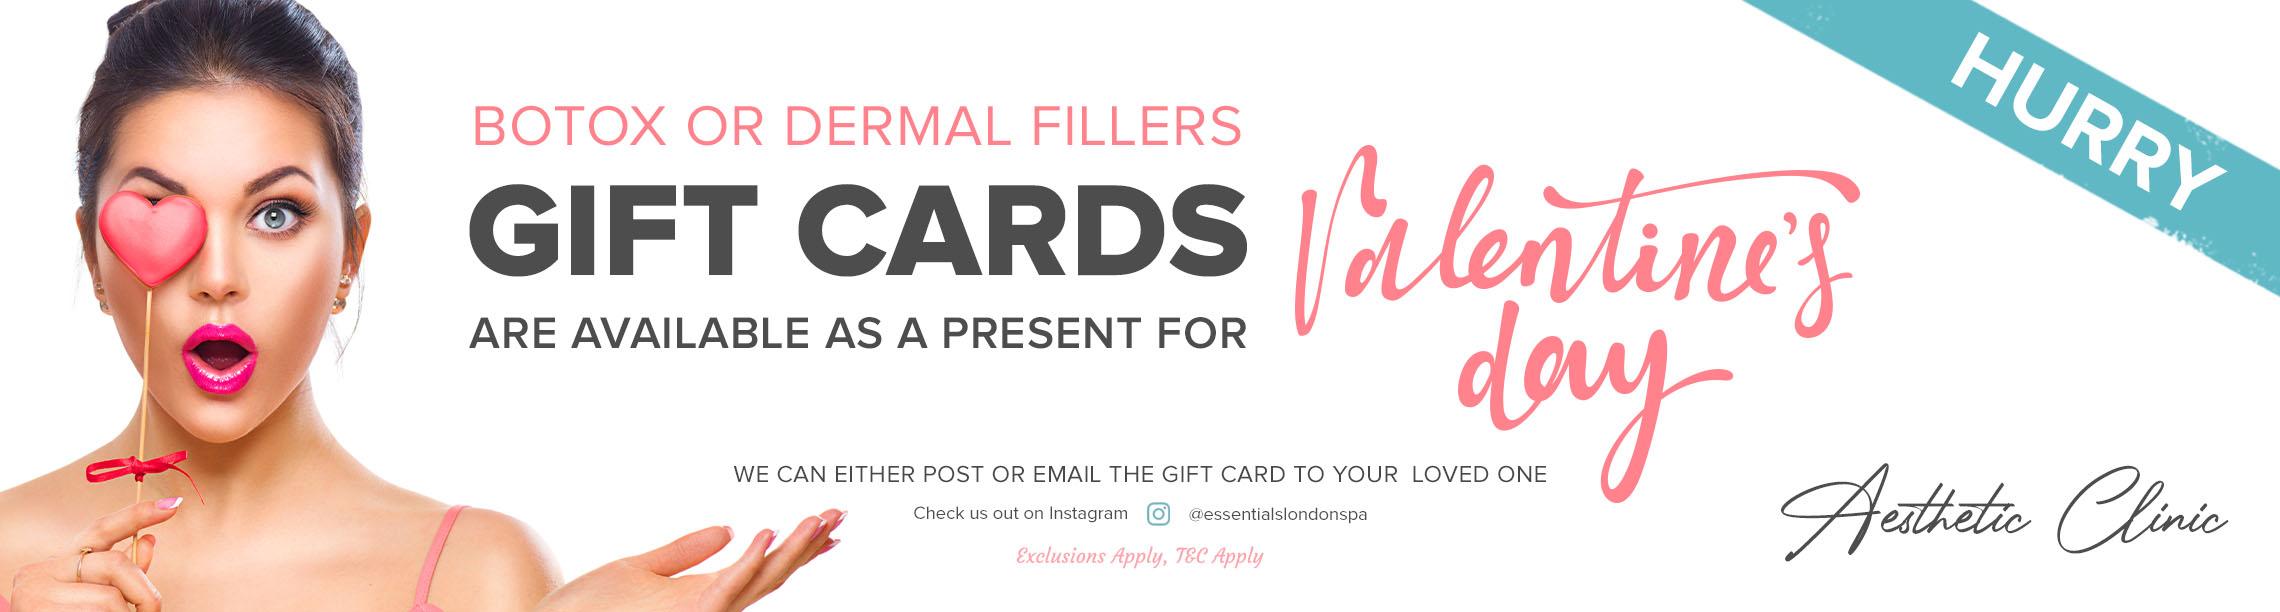 Botox or Dermal Fillers Gift Cards